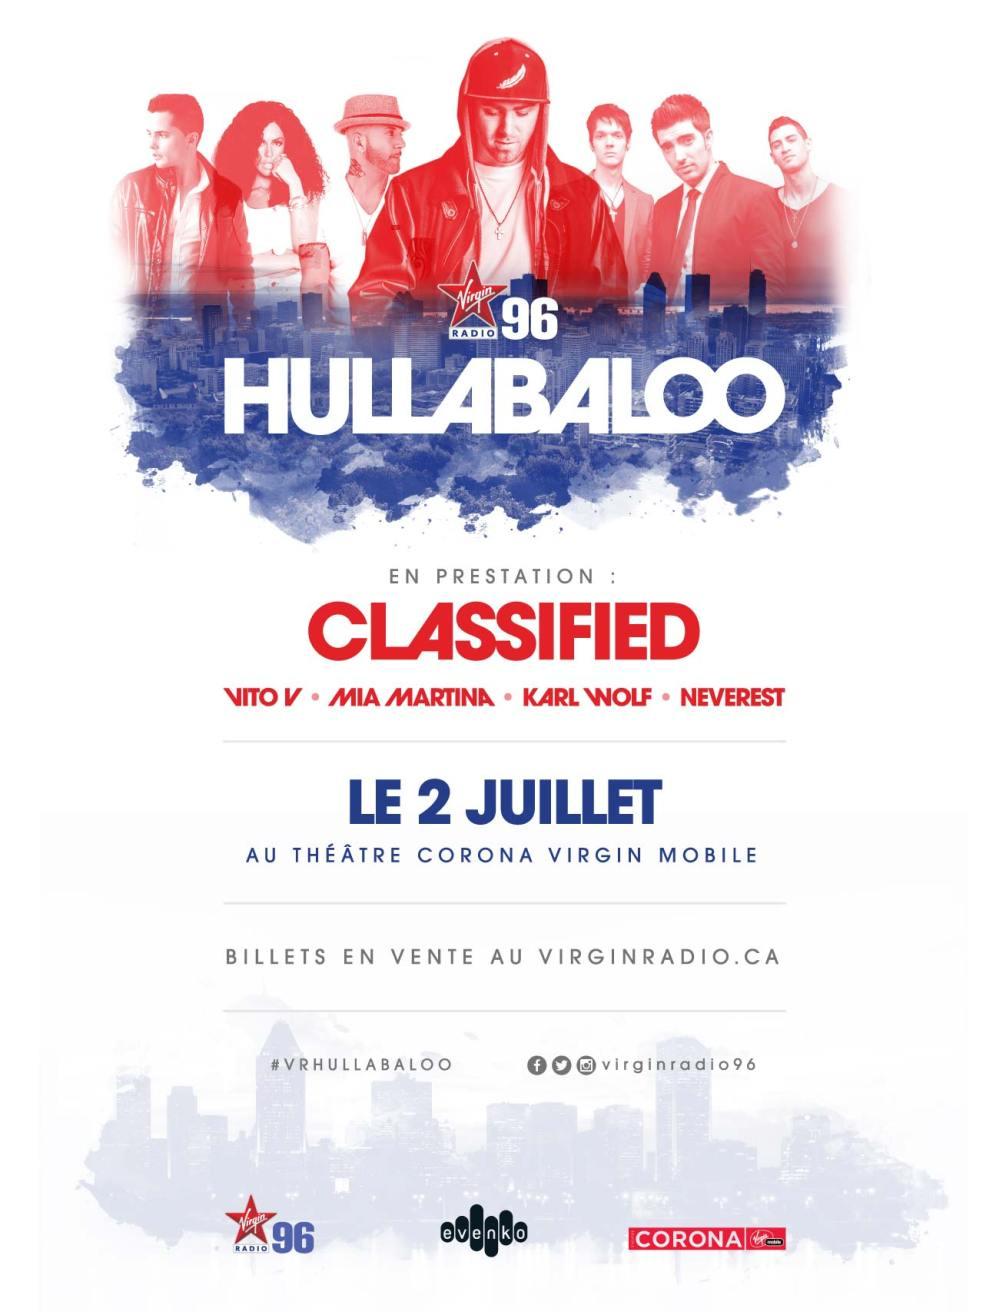 Virgin Radio's Hullabaloo Poster - FR